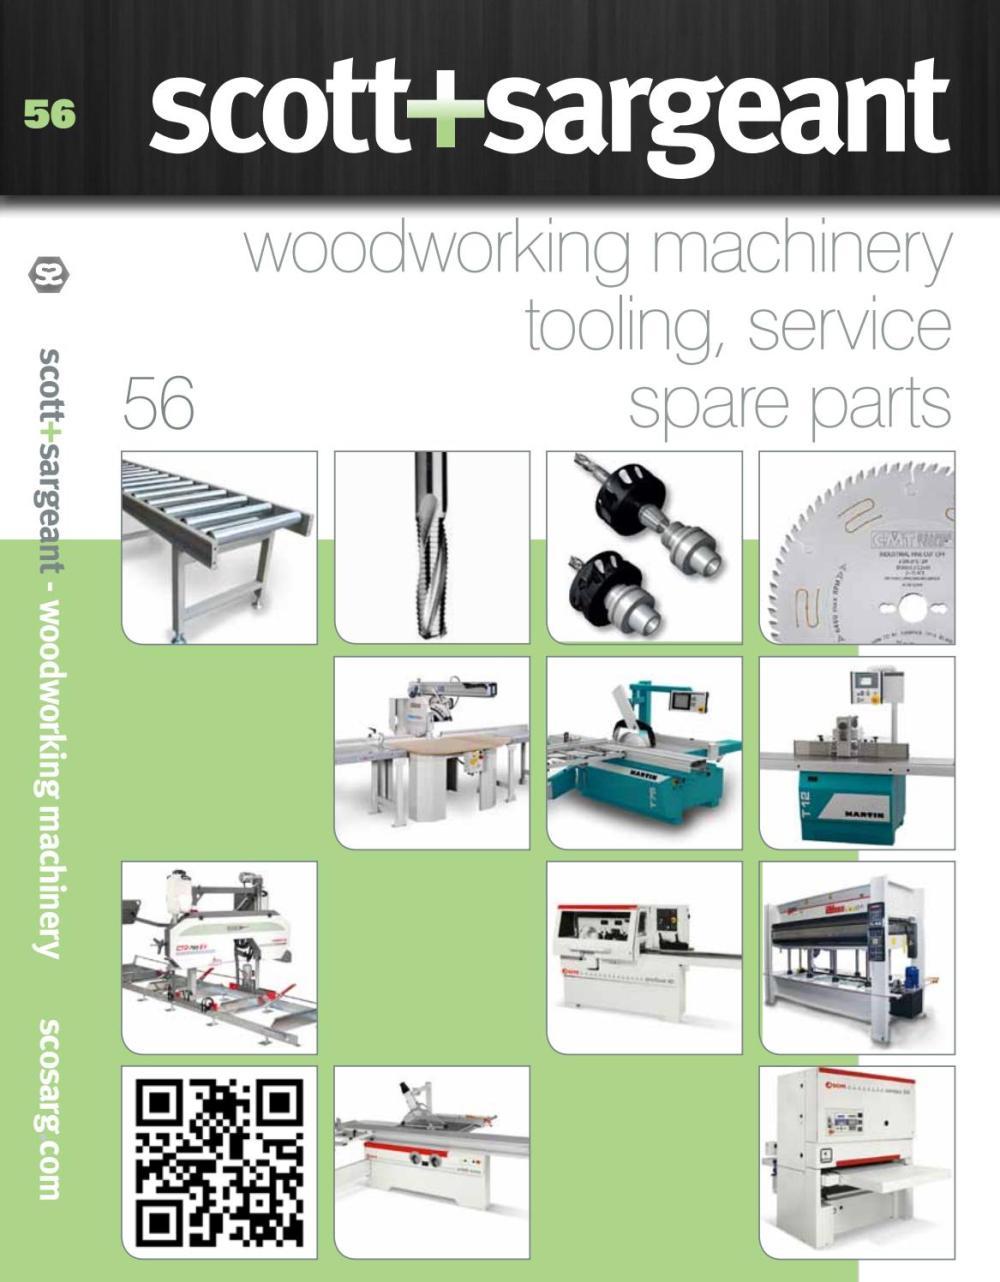 medium resolution of scott sargeant woodworking machinery catalogue 56 by scott sargeant woodworking machinery issuu